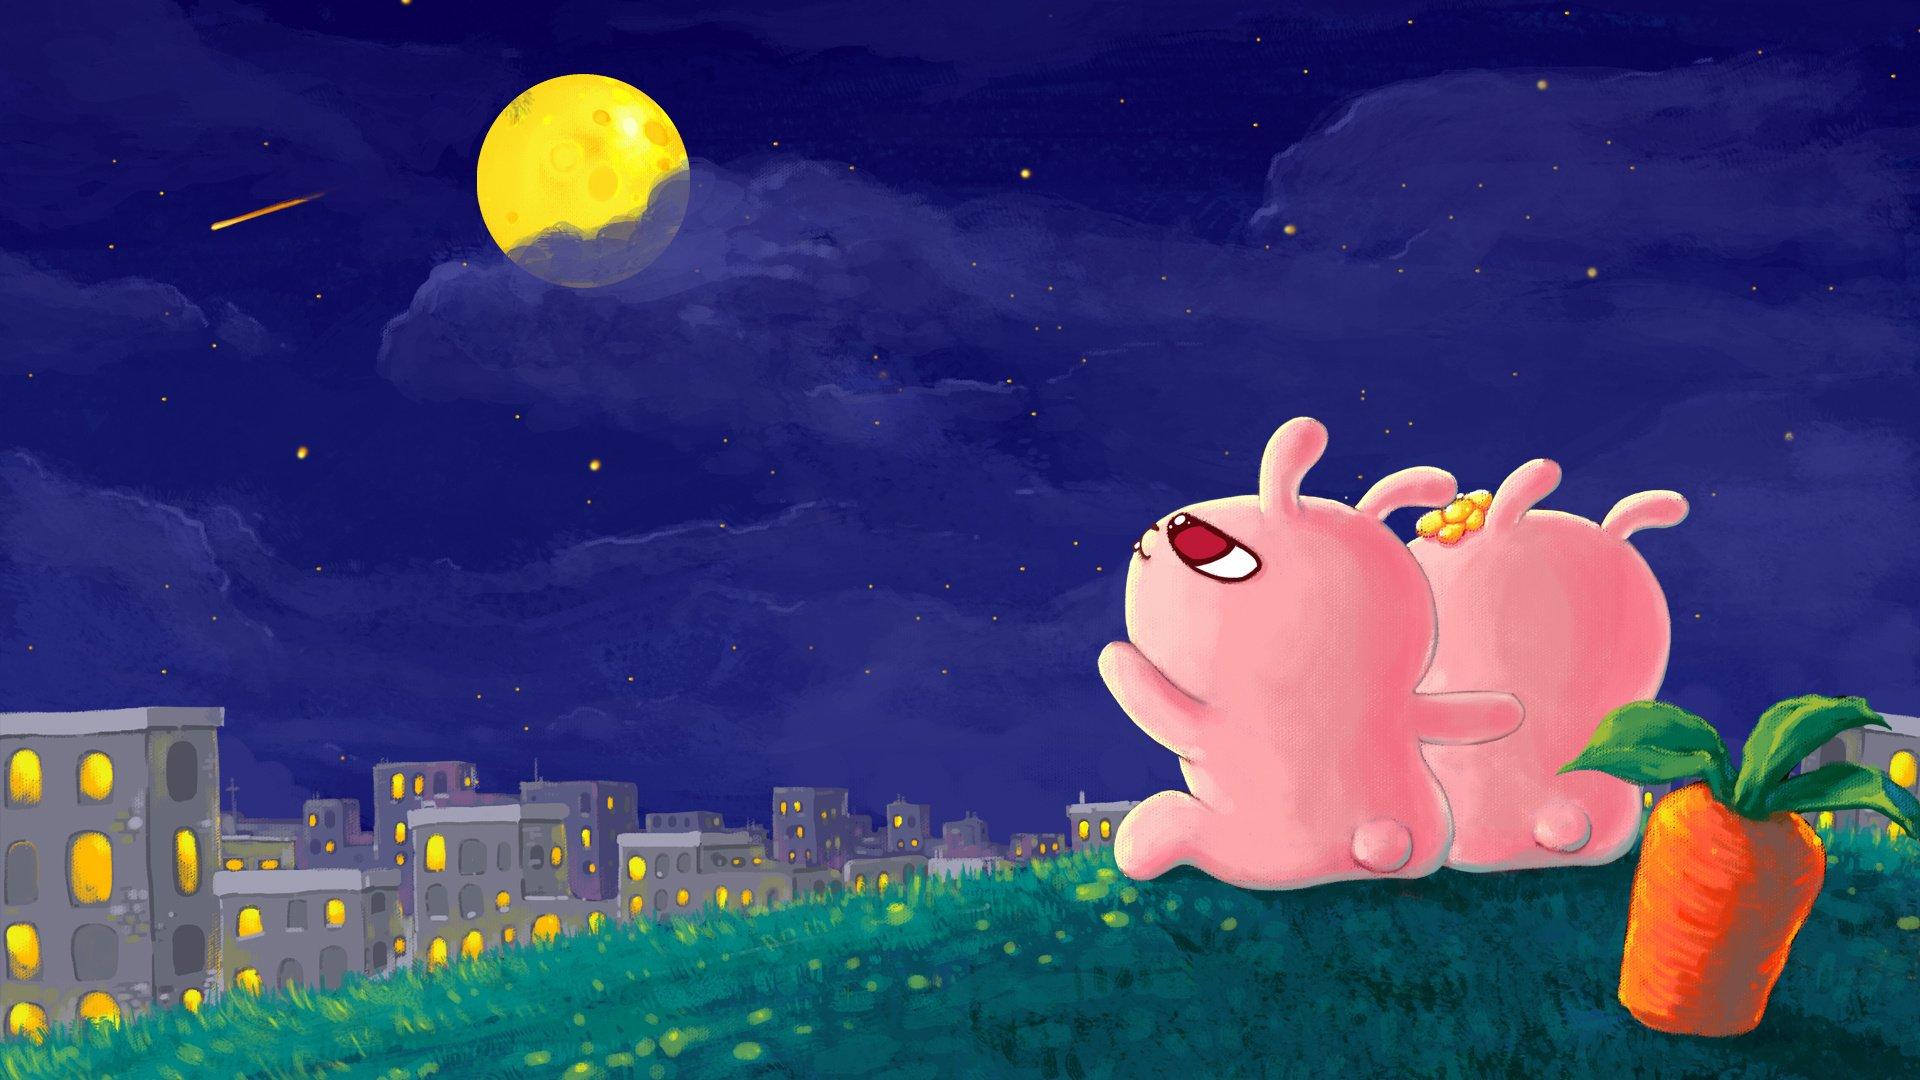 android安卓动漫 卡通 兔子 冷兔 插画 可爱 月亮高清